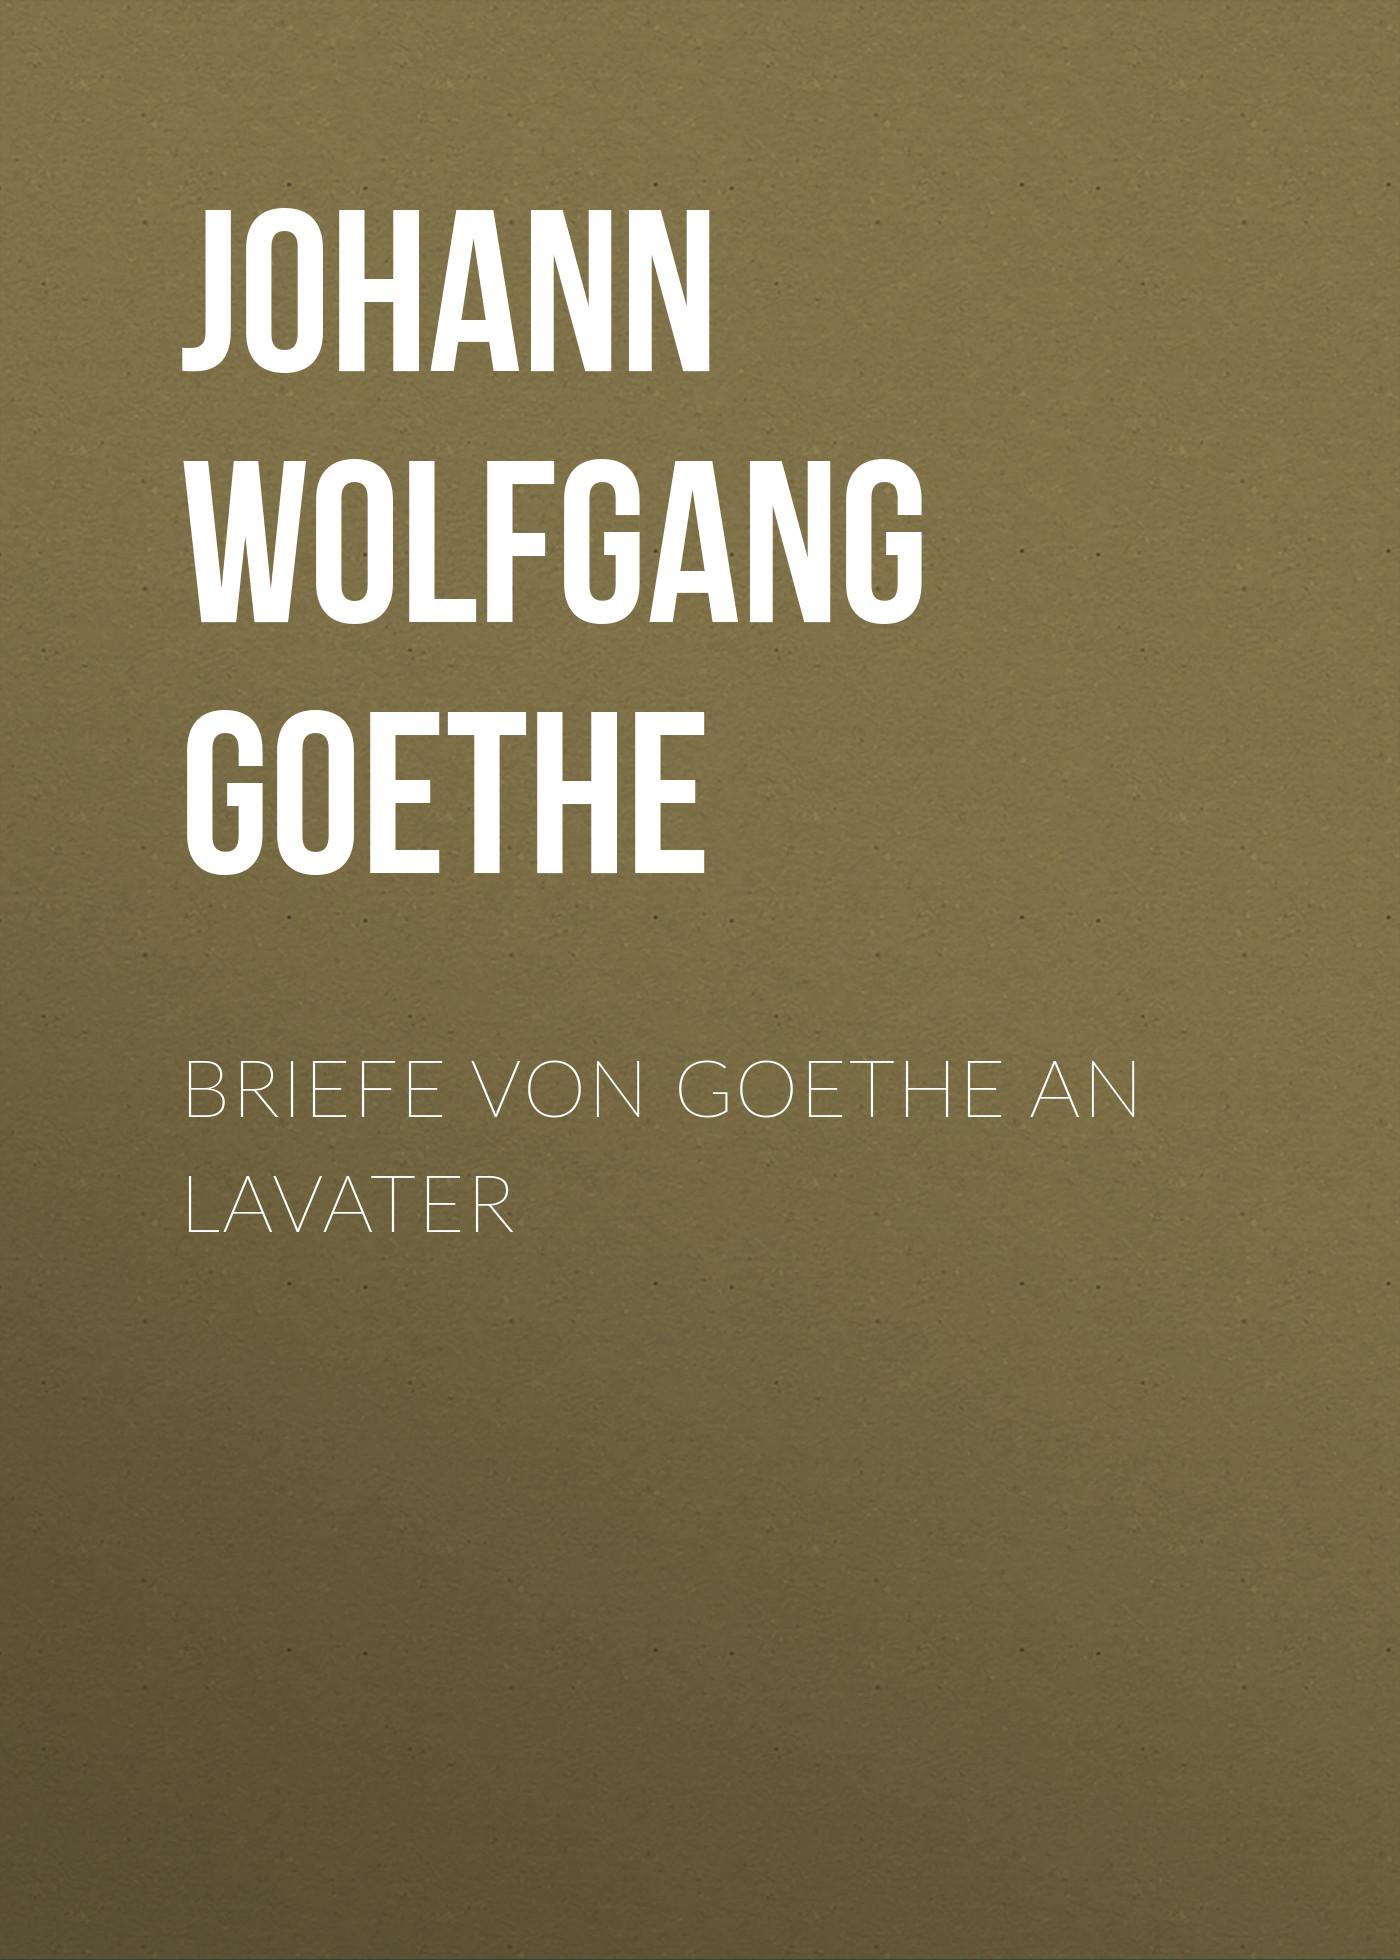 Иоганн Вольфганг фон Гёте Briefe von Goethe an Lavater j c lavater goethe und lavater german edition